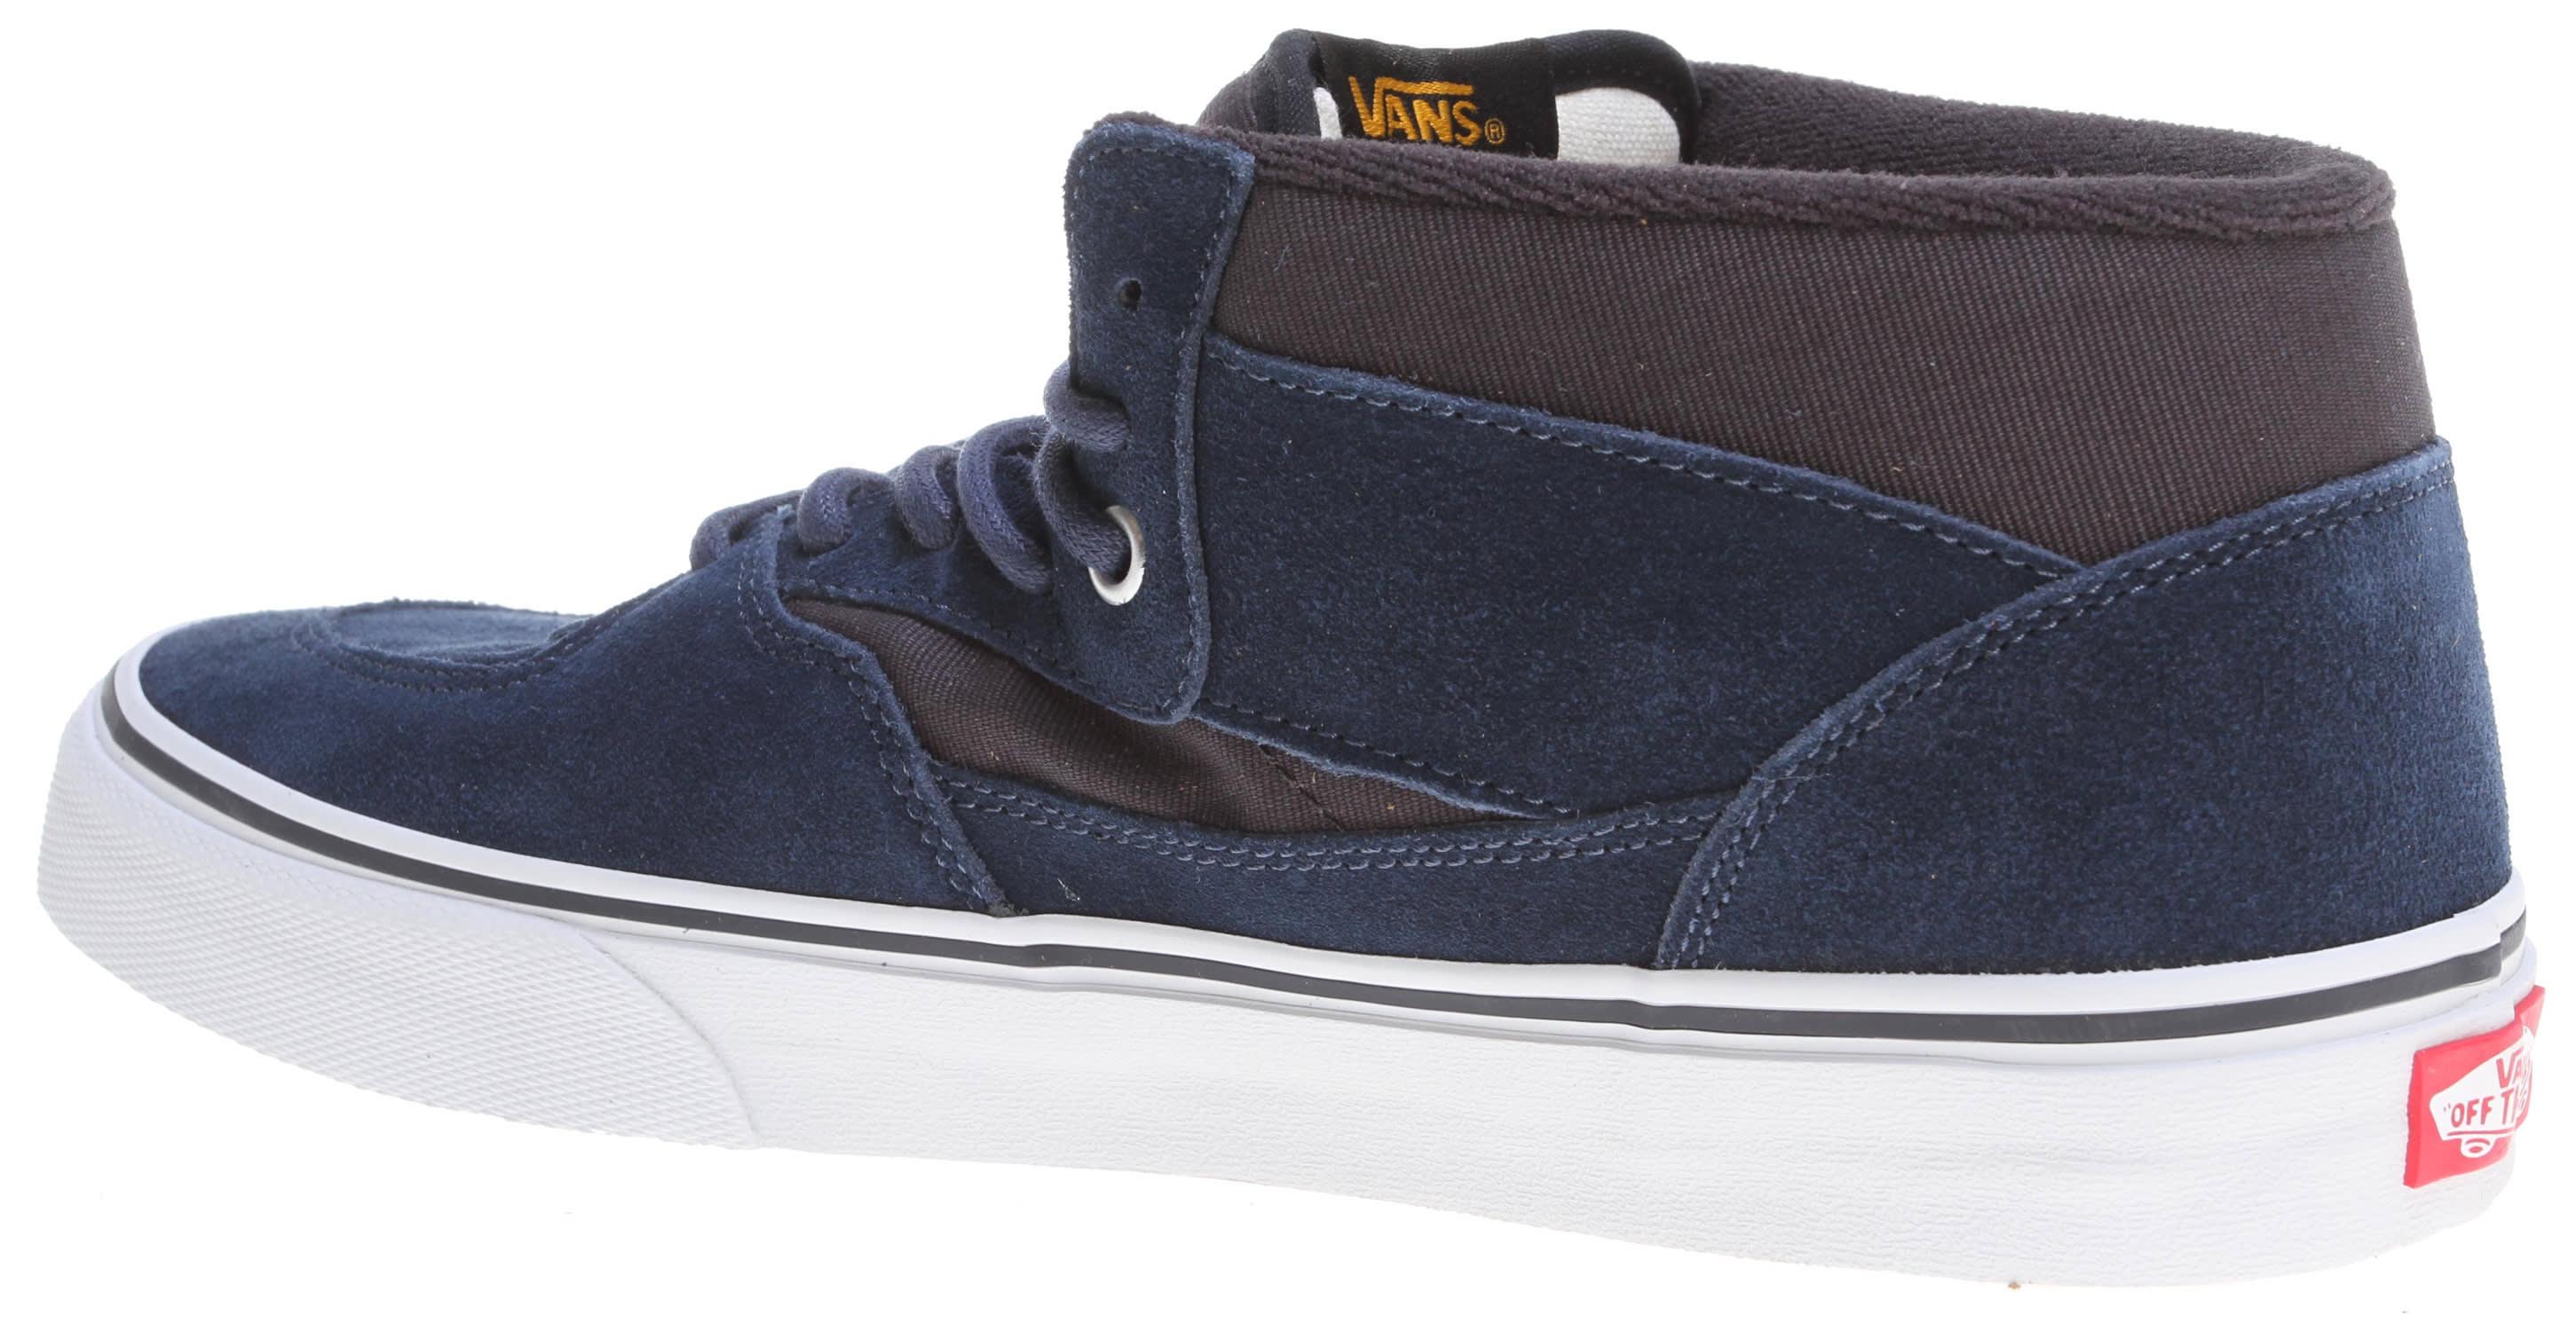 a6bca48af4 Vans Half Cab Skate Shoes - thumbnail 3